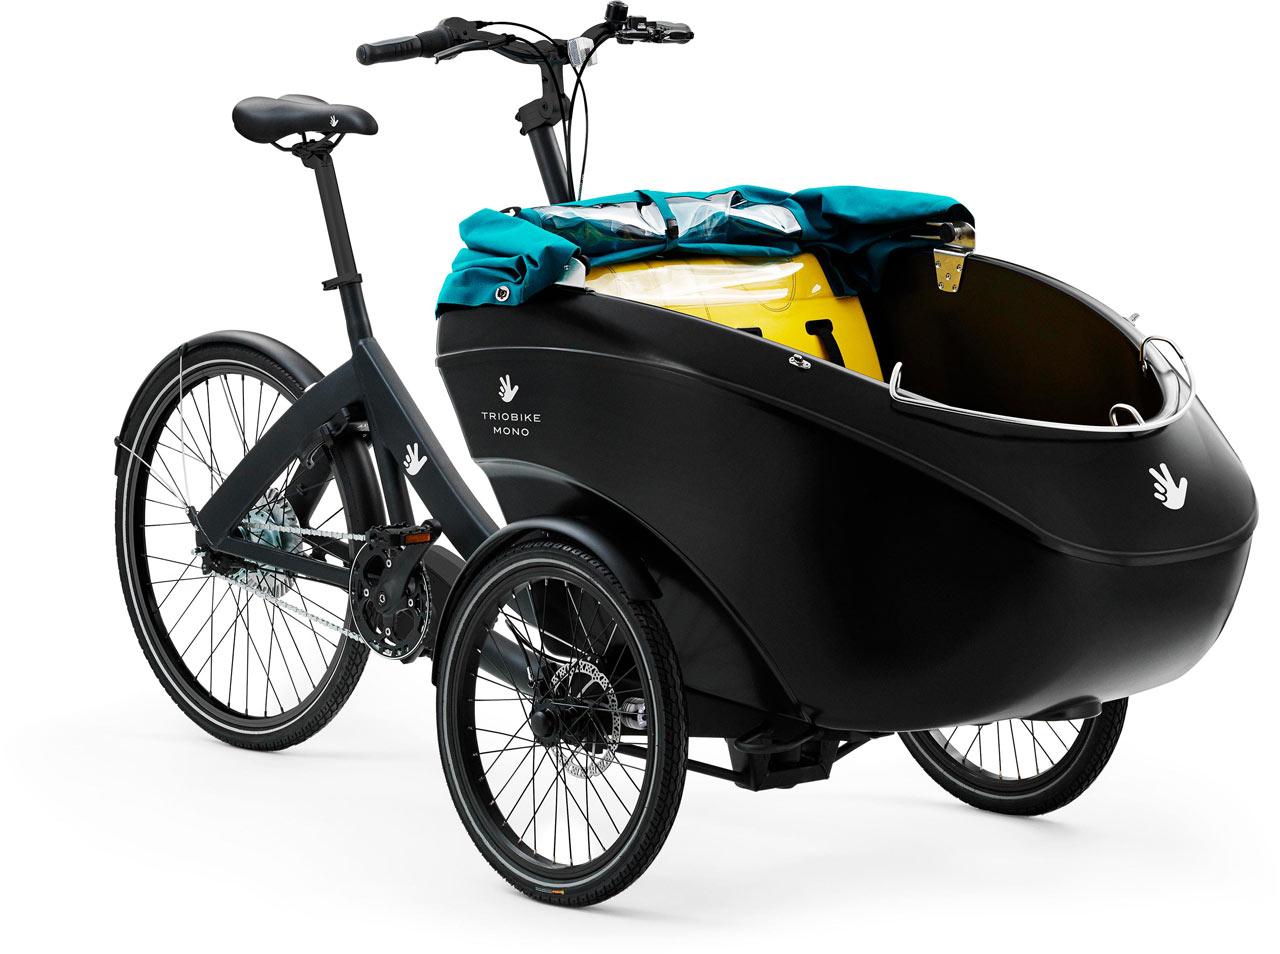 Triobike Mono E Nexus Lasten e-Bike / Cargo e-Bike 2021